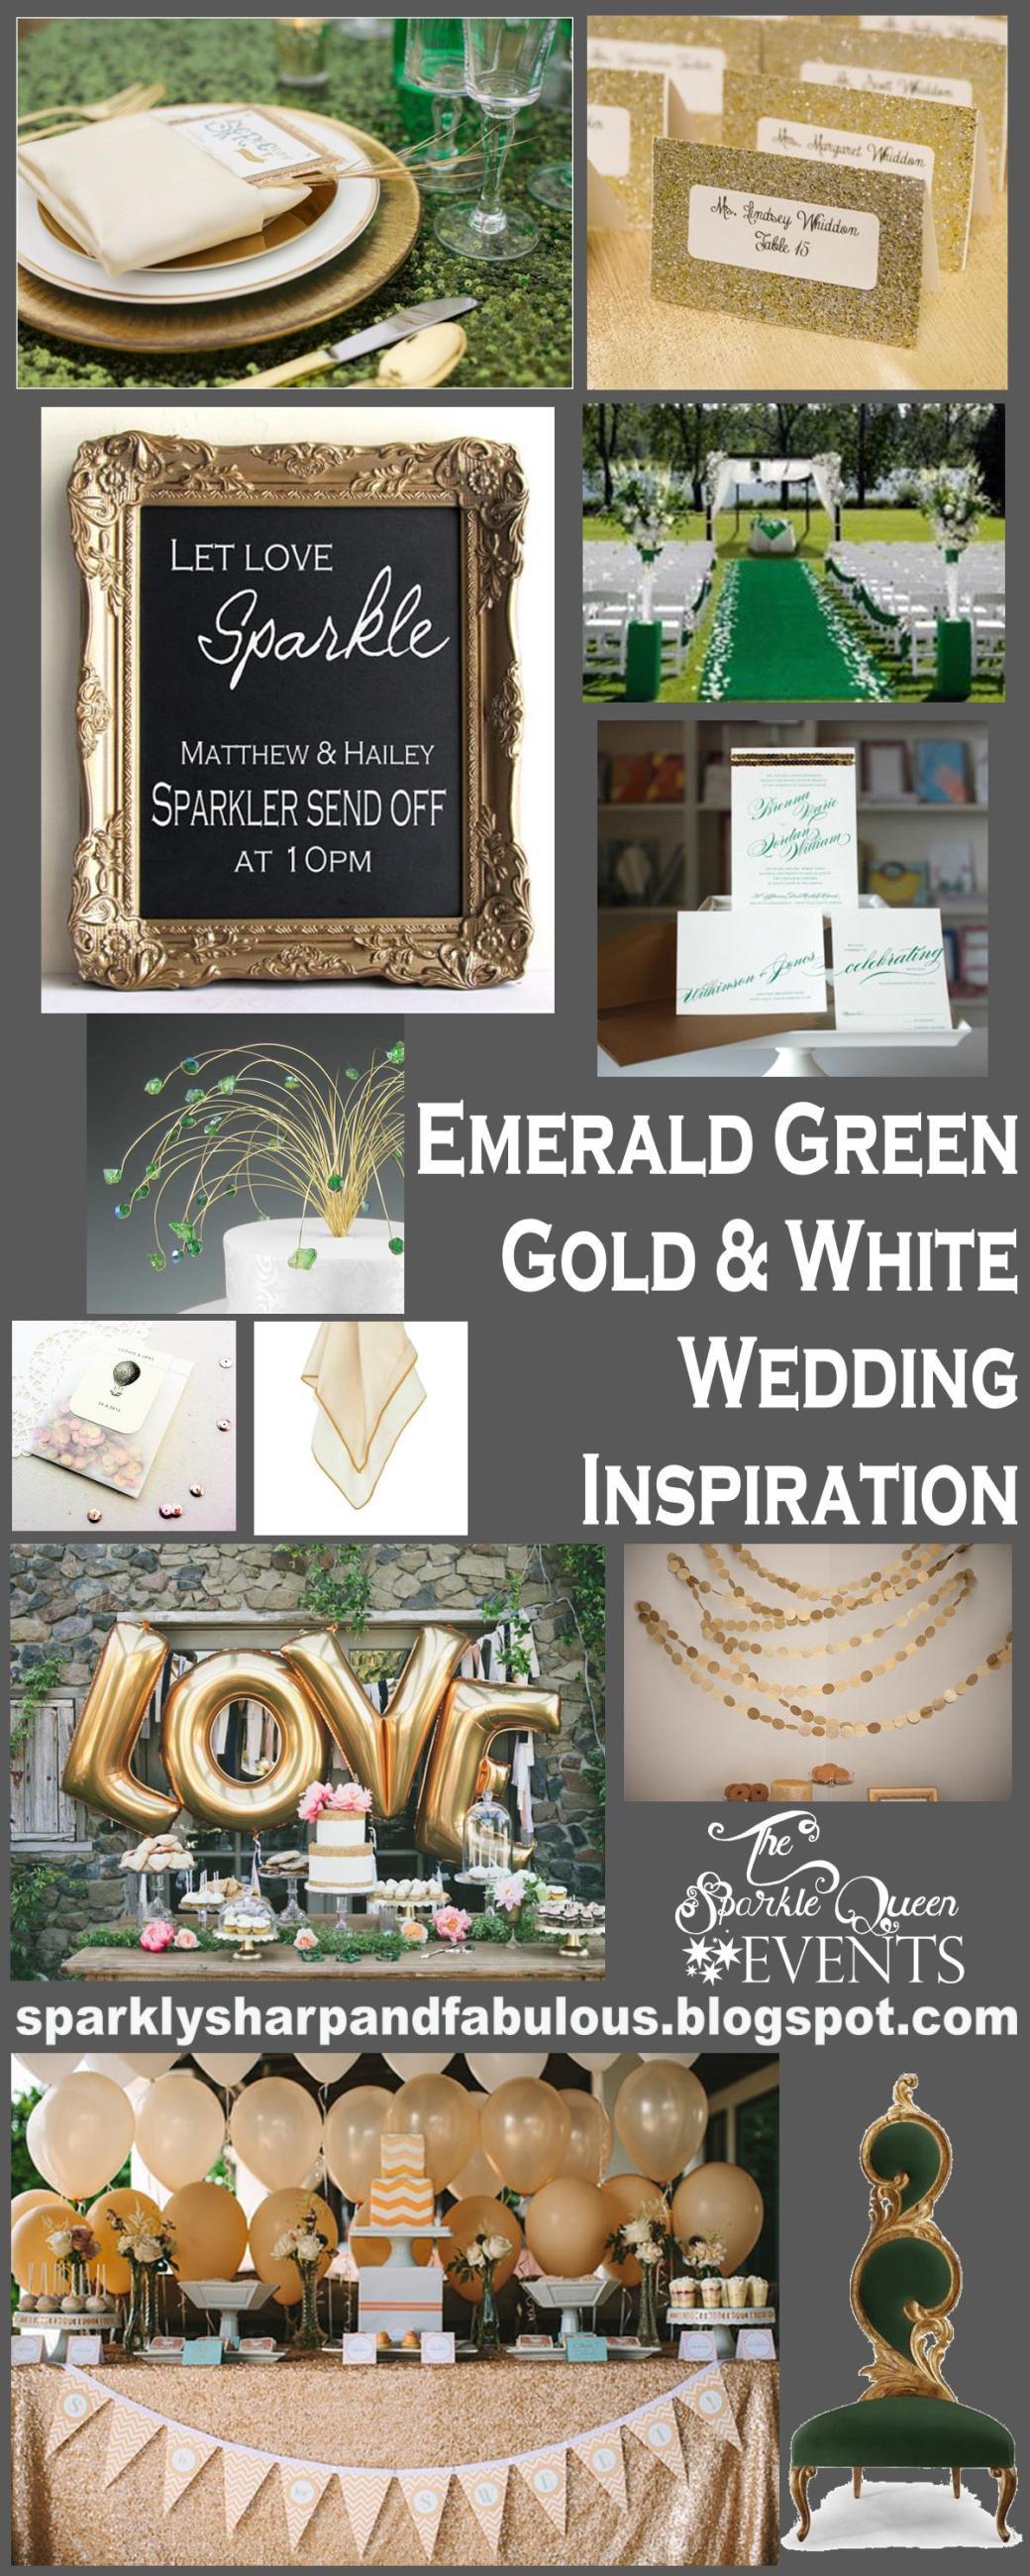 http://sparklysharpandfabulous.blogspot.com/2013/06/emerald-green-gold-and-white-wedding_26.html